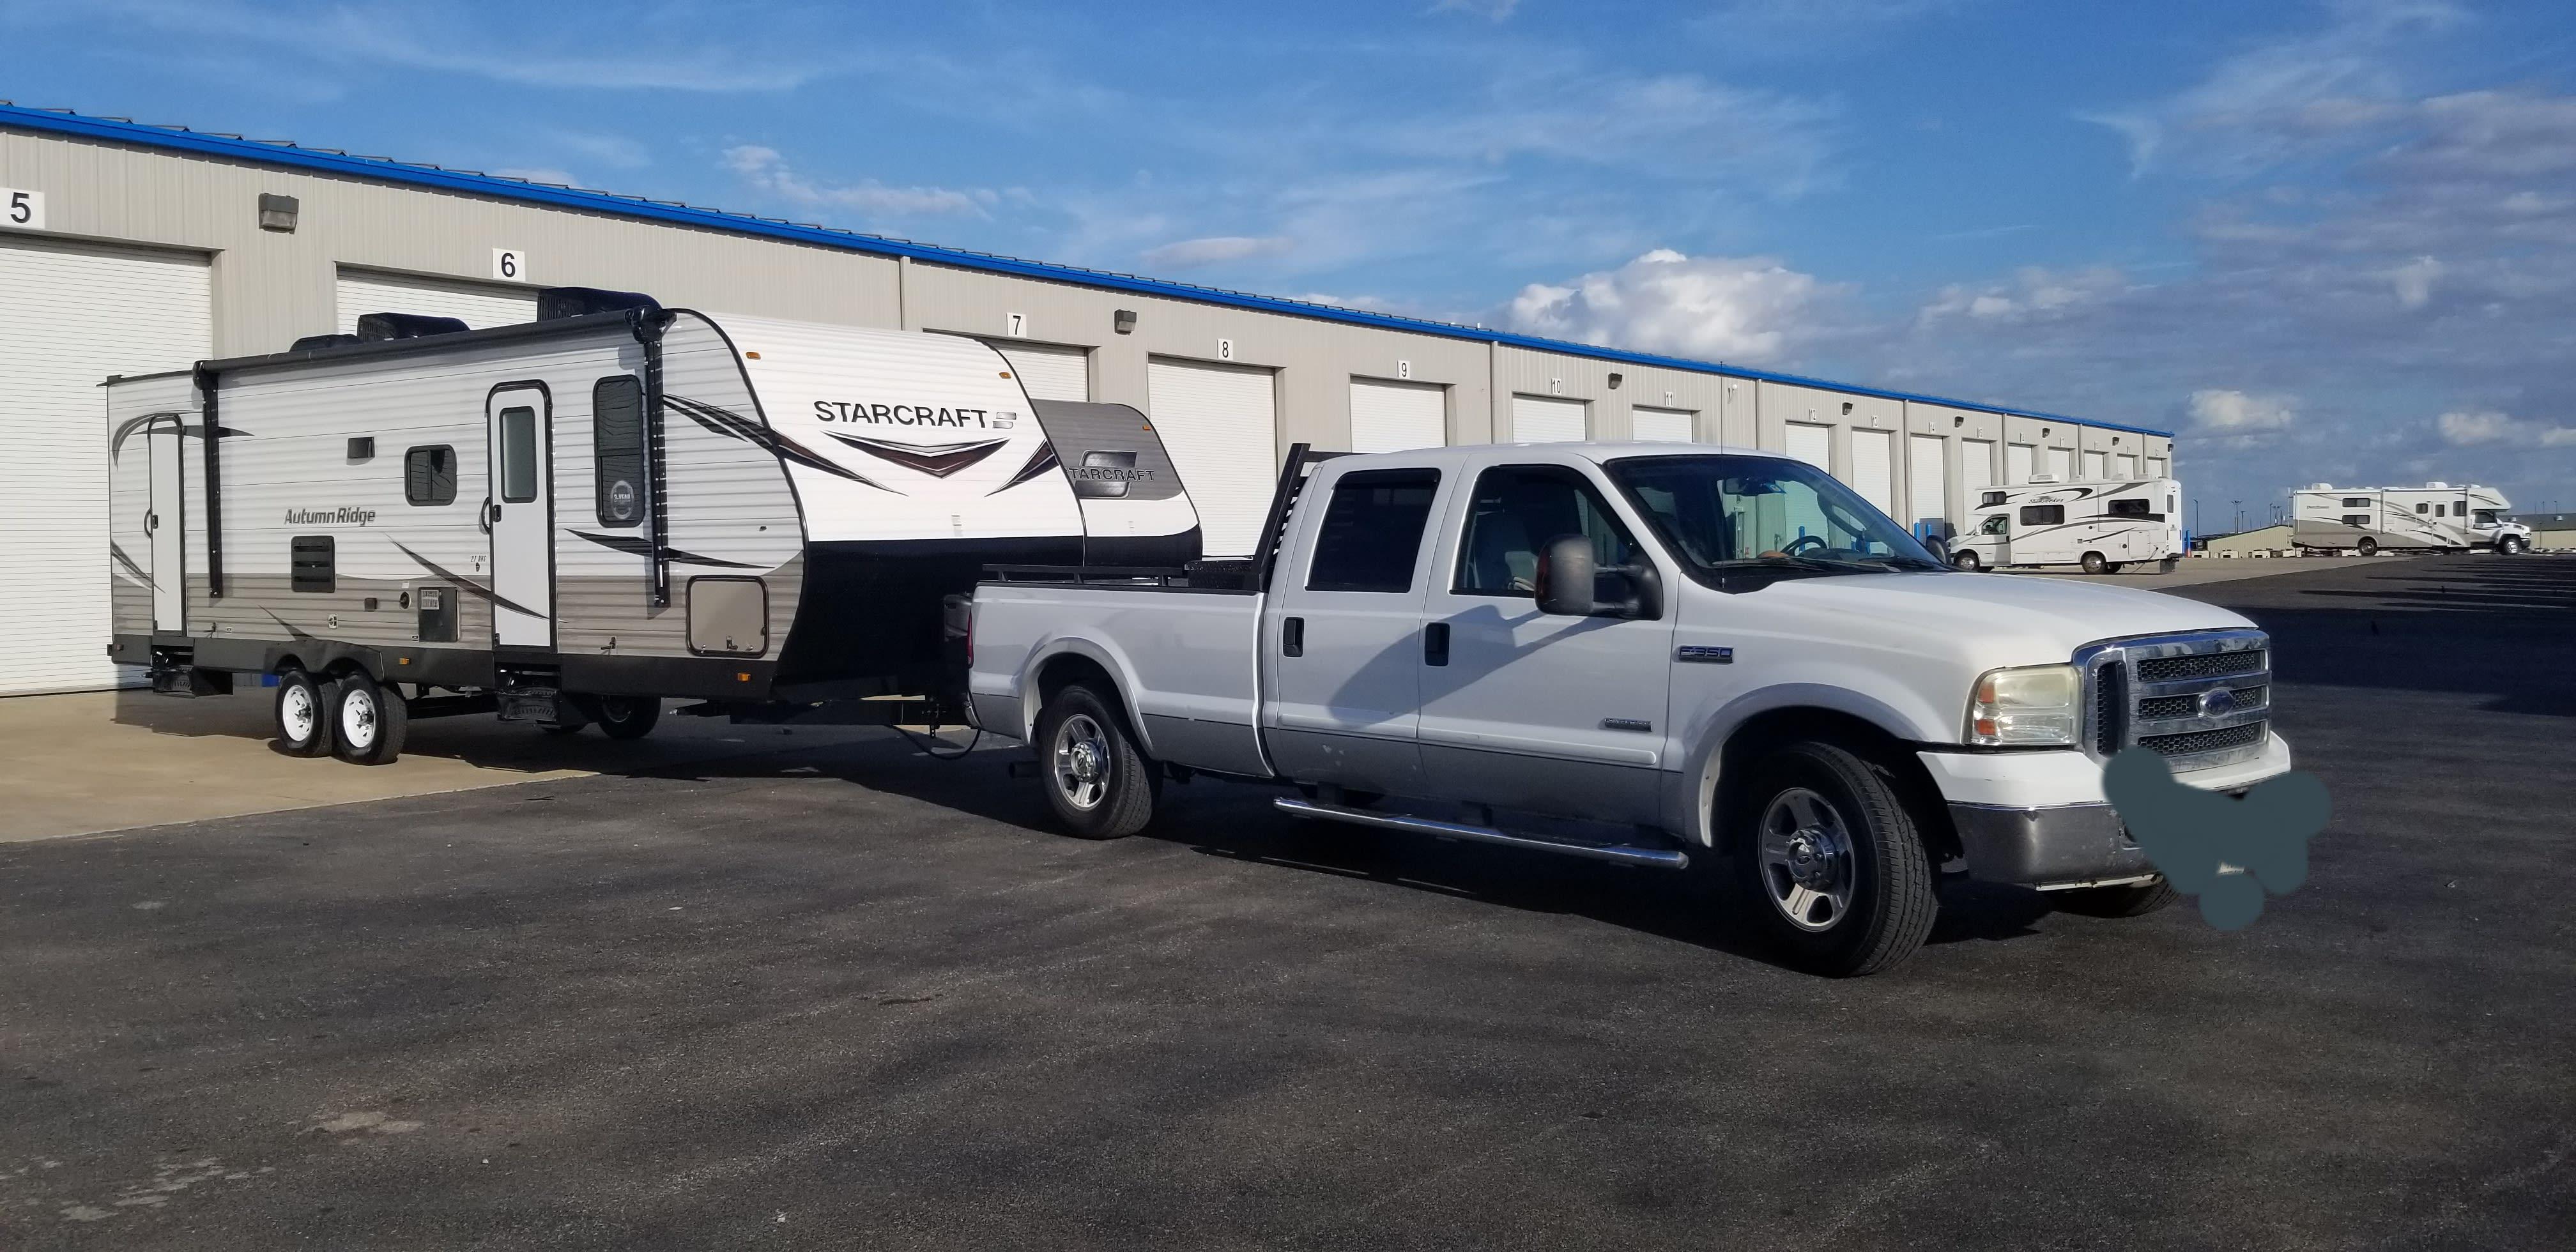 Towing Big Bertha!. Starcraft Autumn Ridge 2020